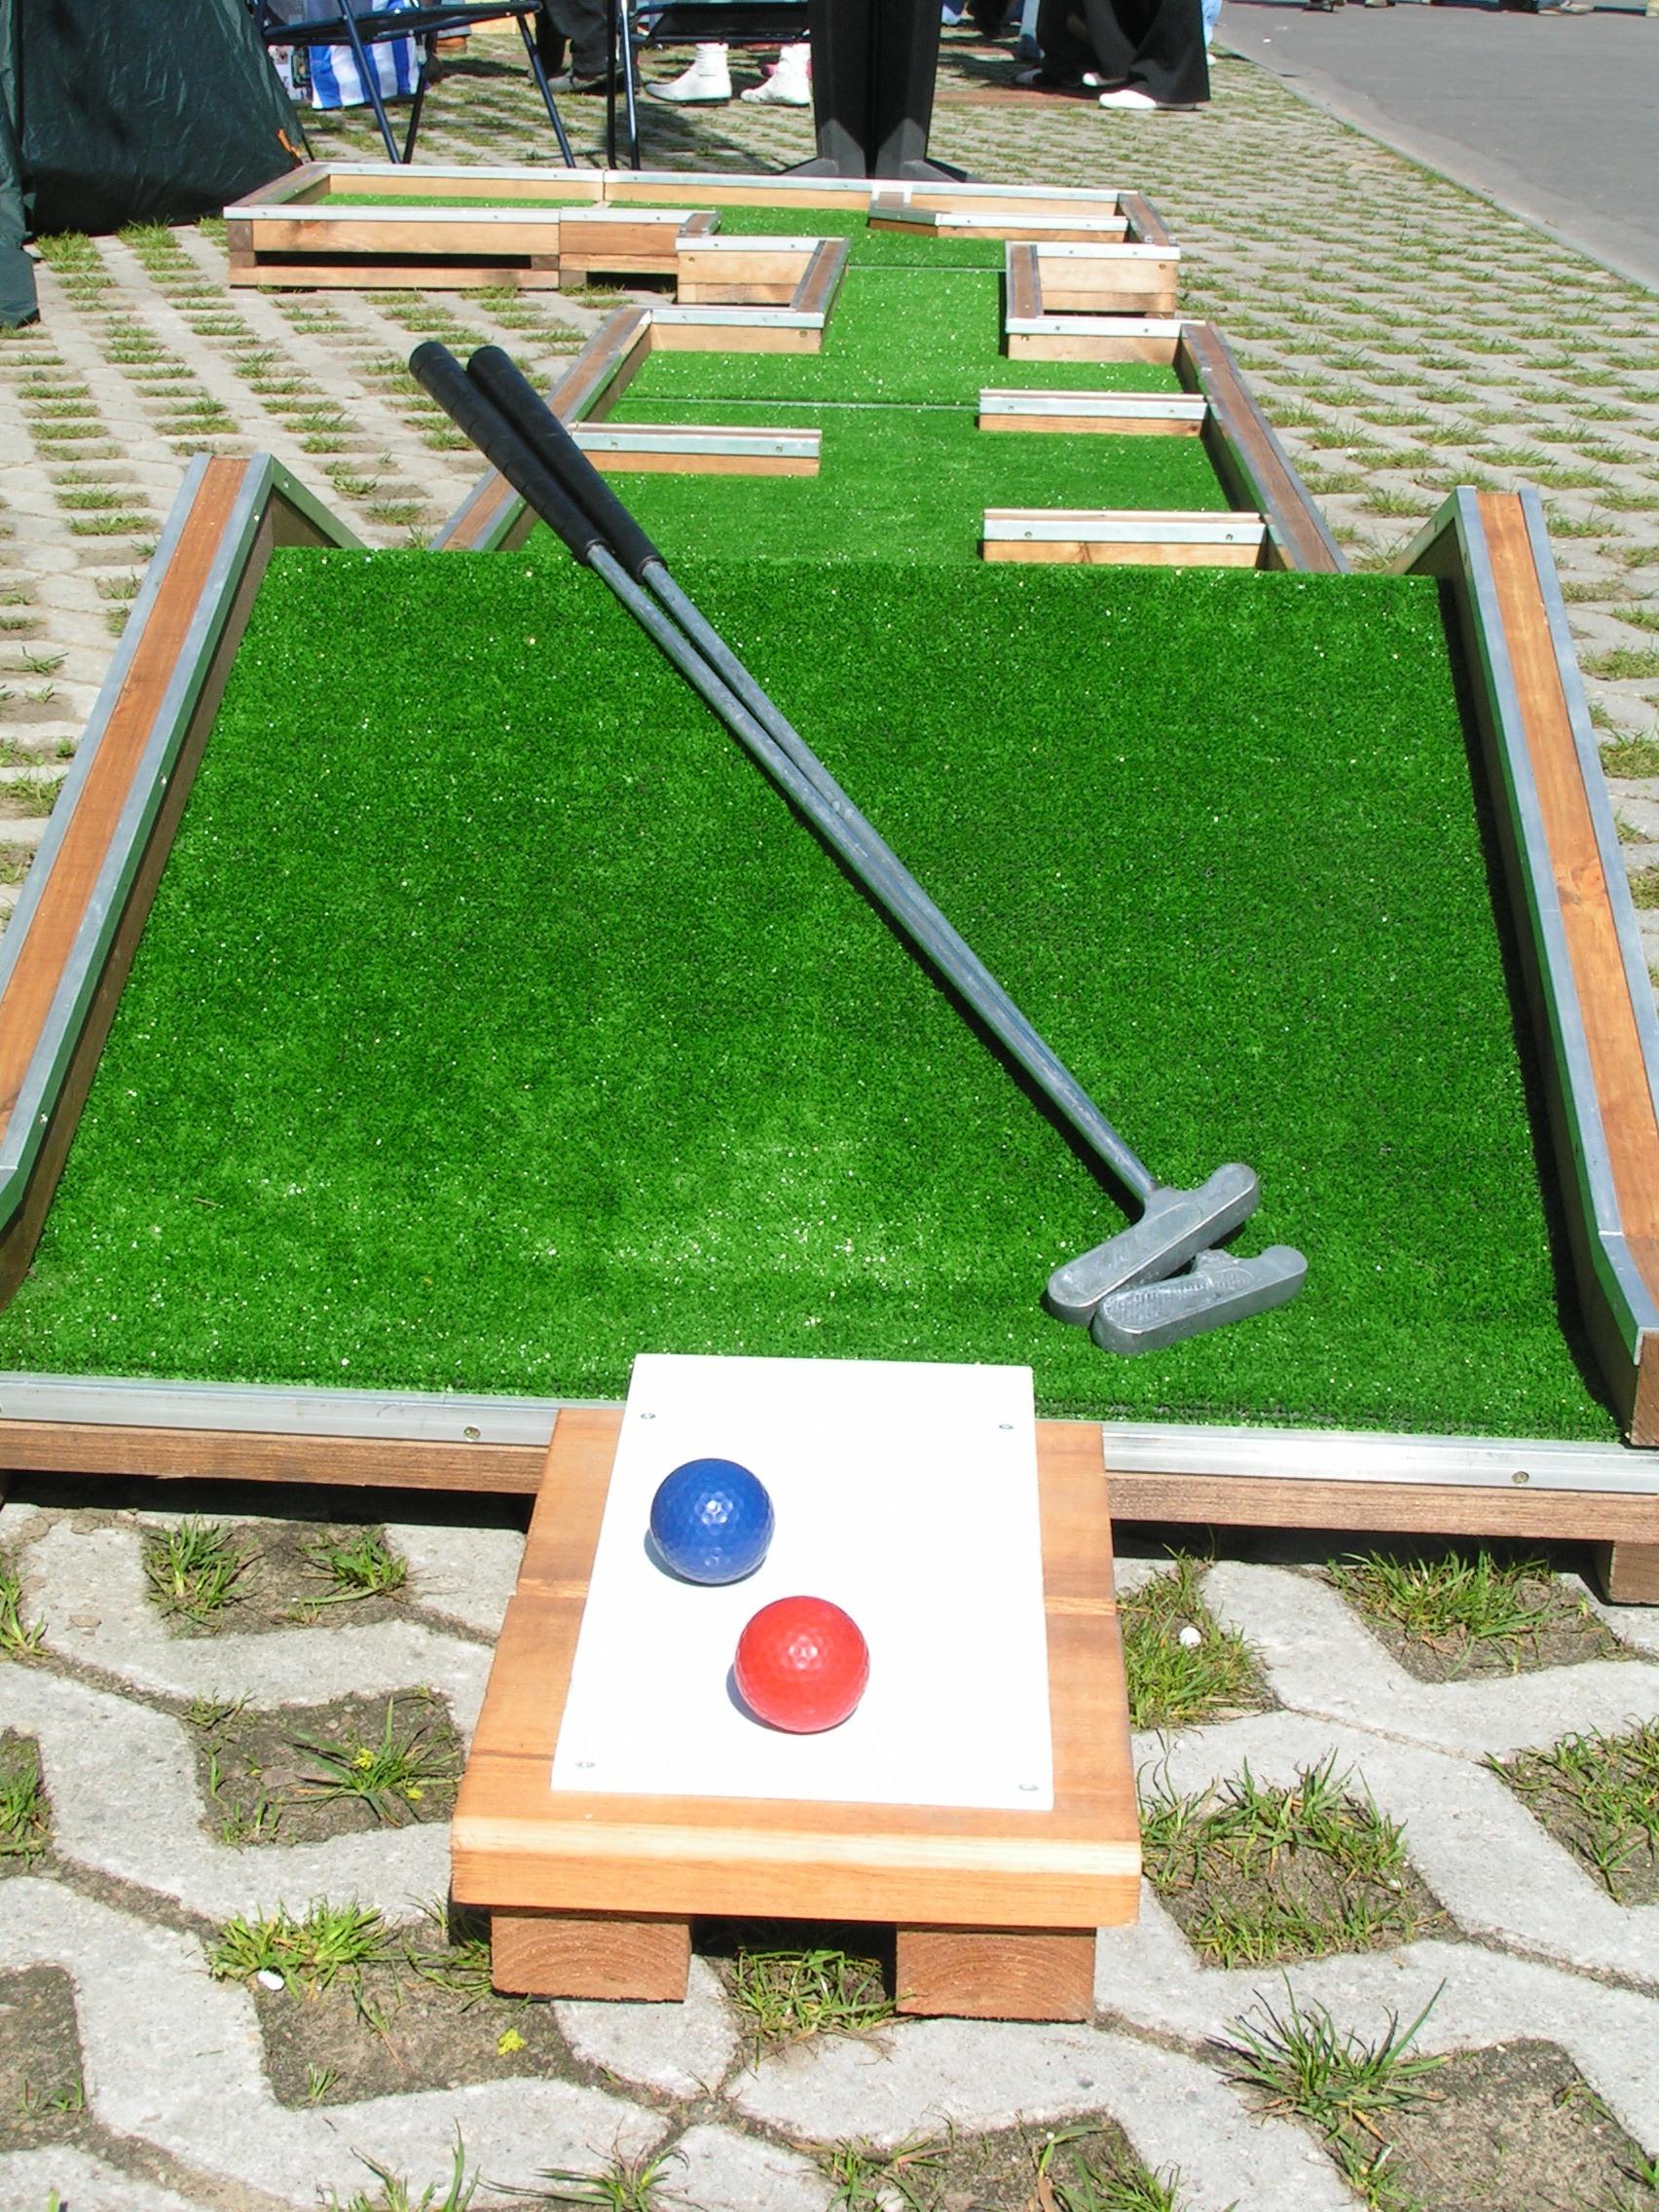 Interchangeable modular mini golf fairway (hole) Image